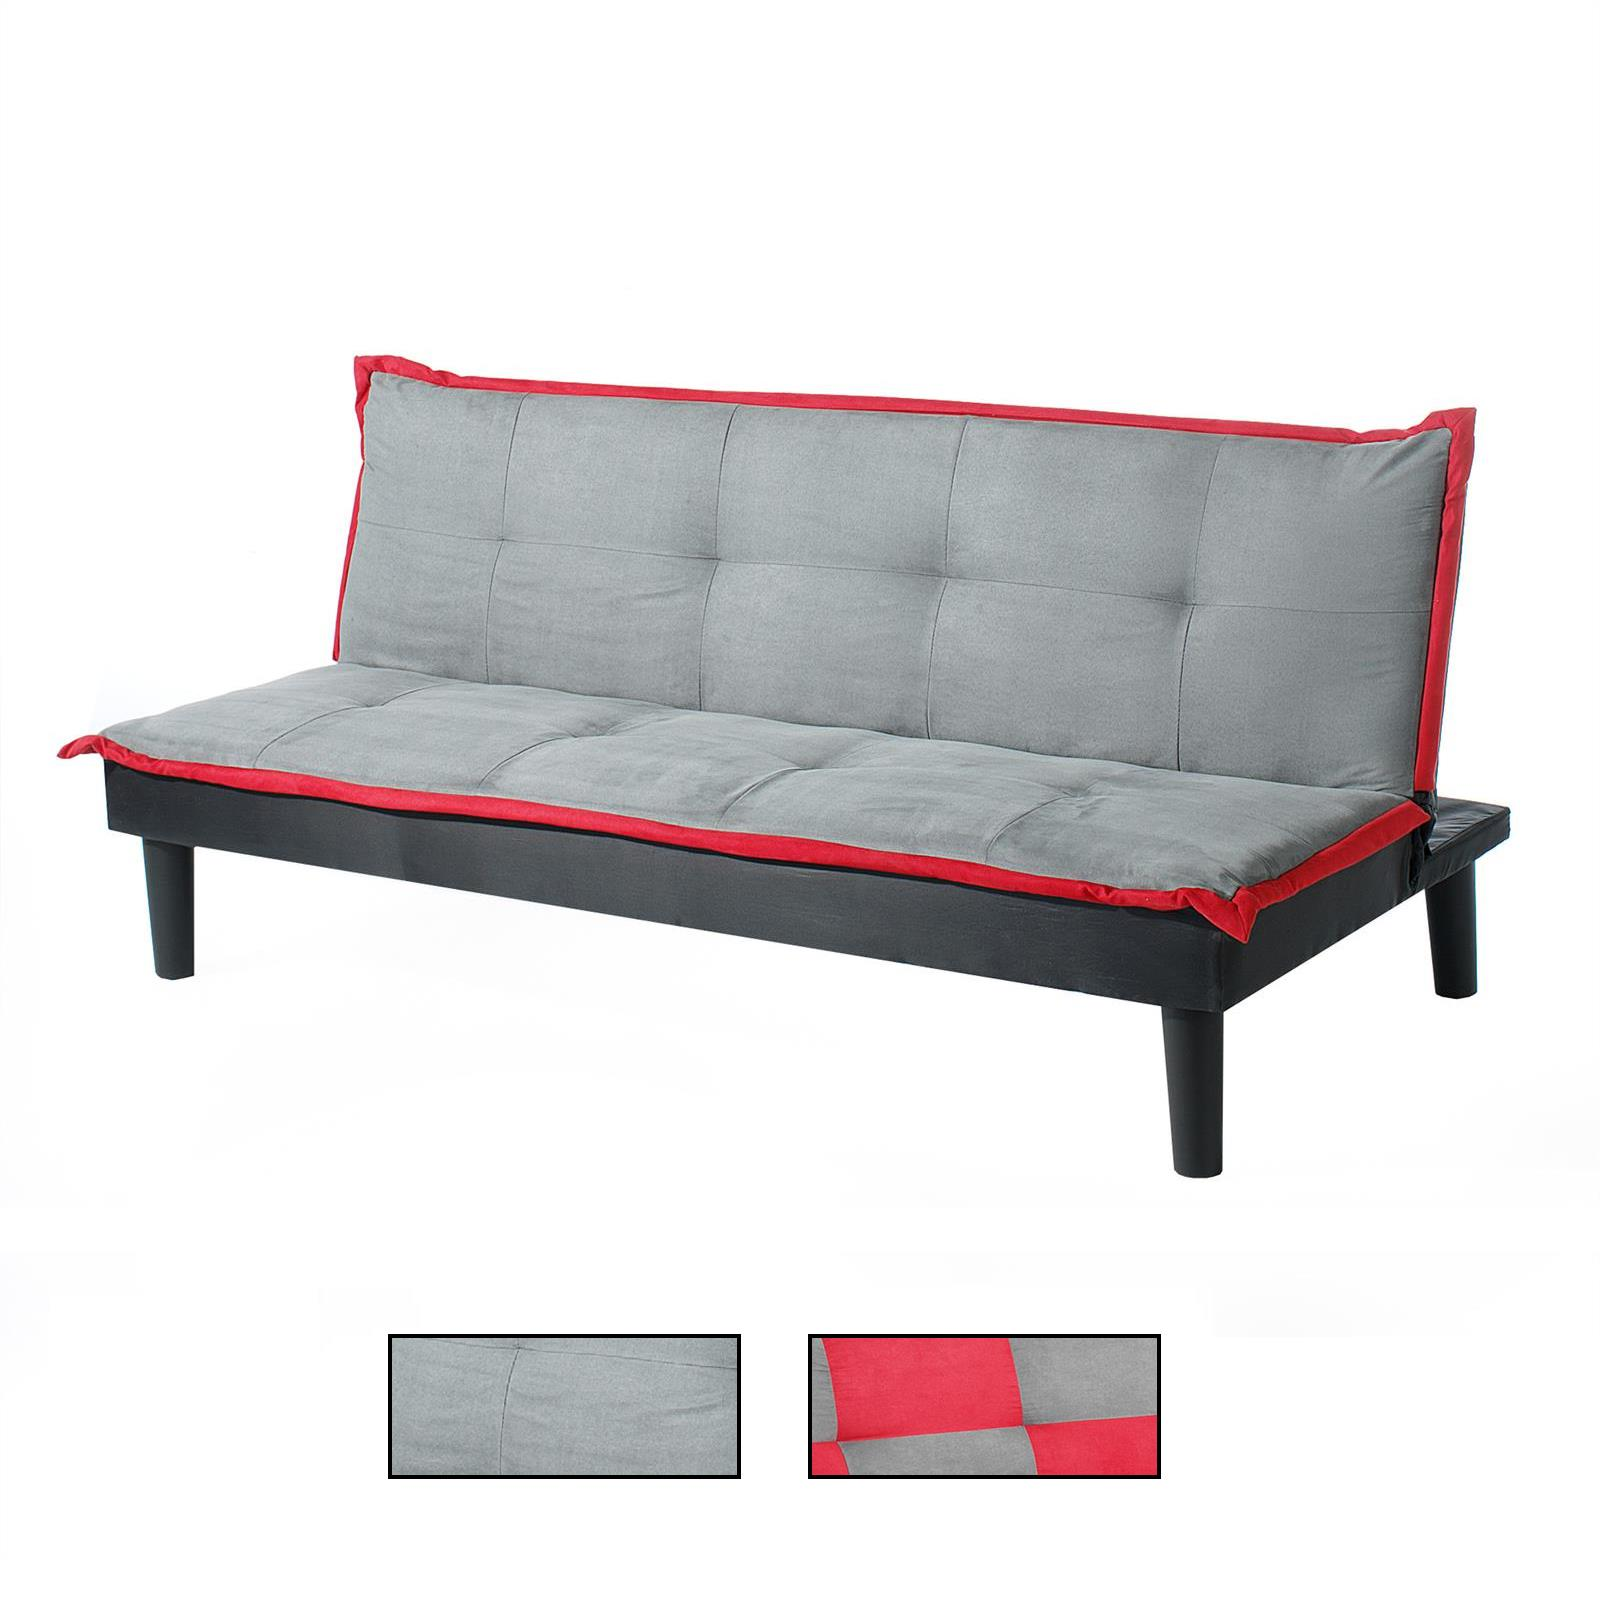 3 sitzer schlafsofa claudia in grau rot caro m bel. Black Bedroom Furniture Sets. Home Design Ideas